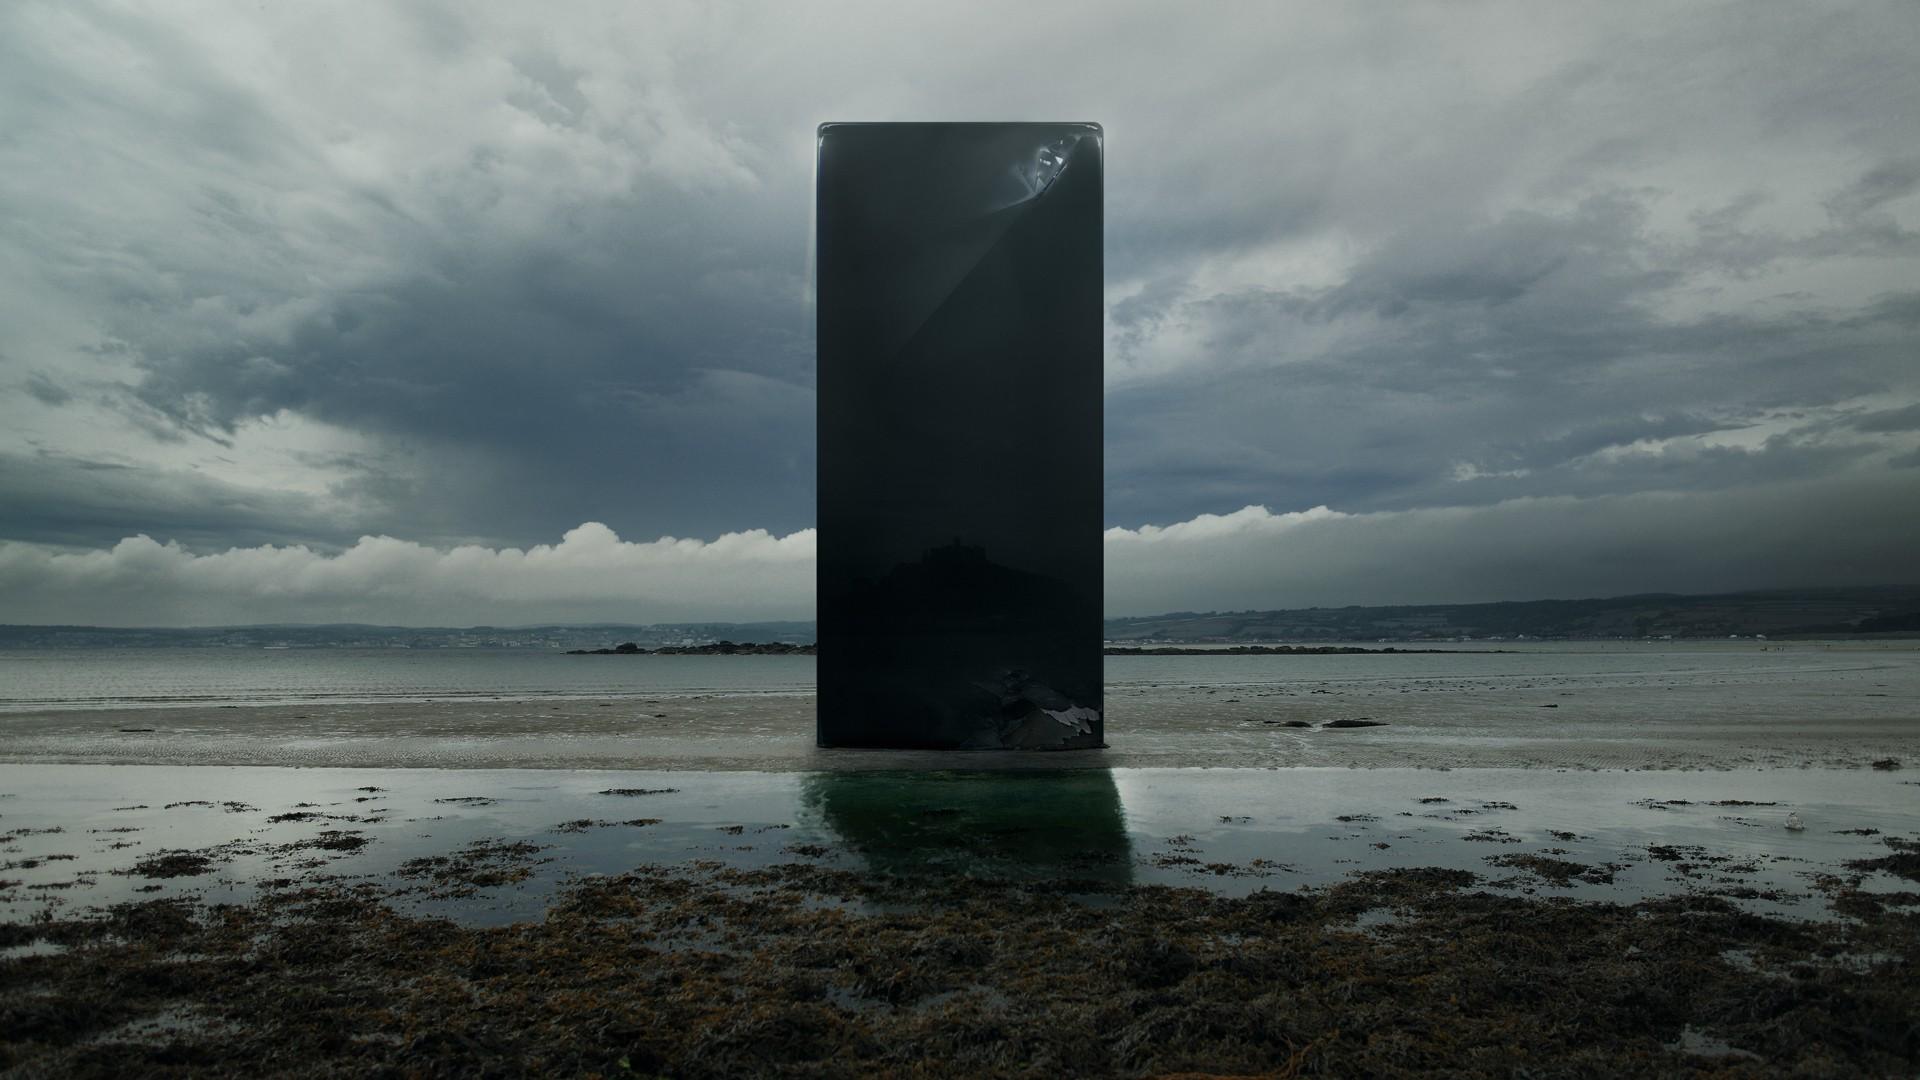 مینیمالی از رویکرد طراحی ظاهری کنسول ایکس باکس سری ایکس